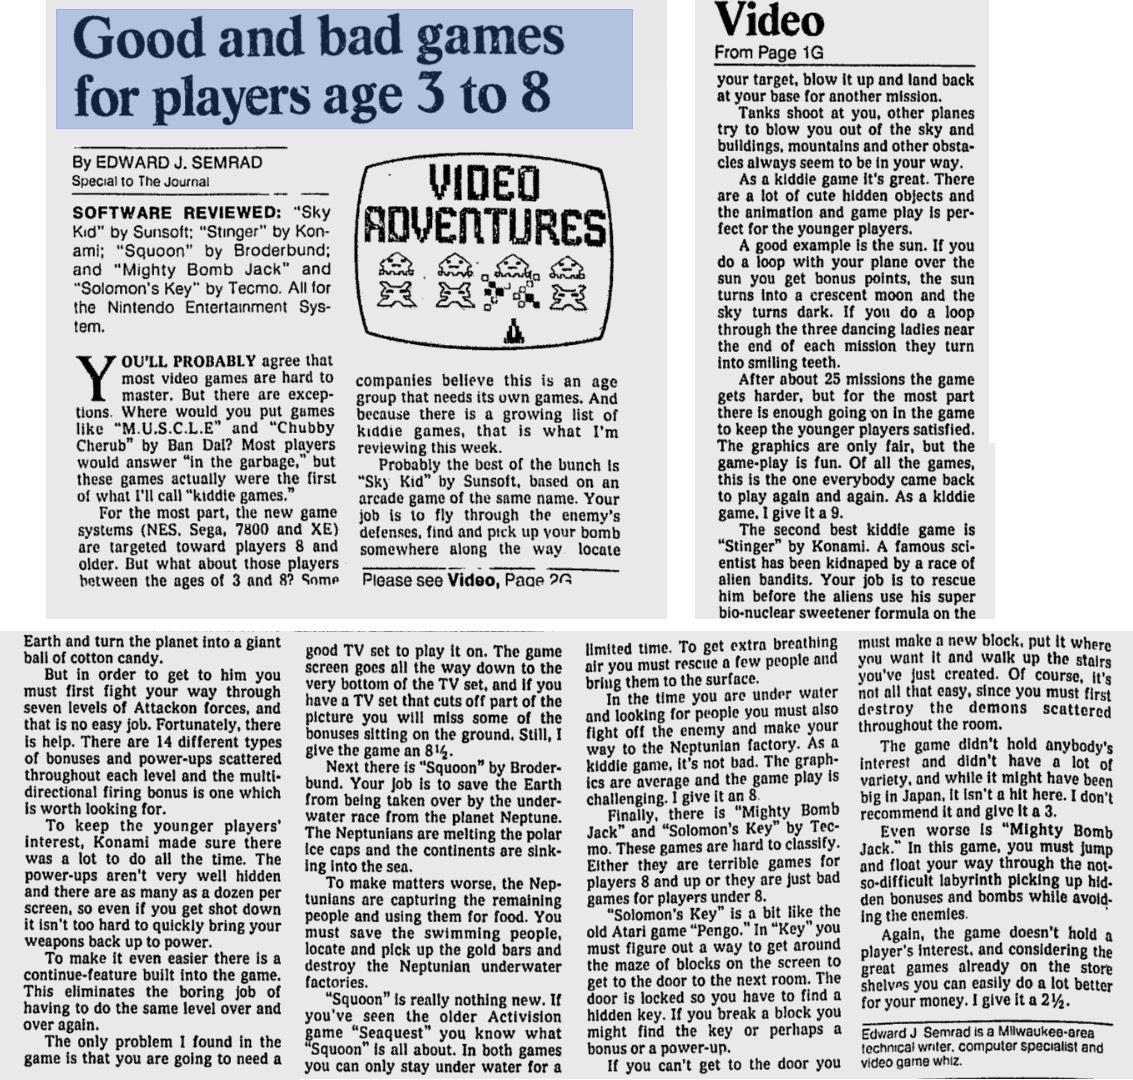 NES Game Reviews - Video Adventures by Ed Semrad - Milwaukee Journal - 12-12-87